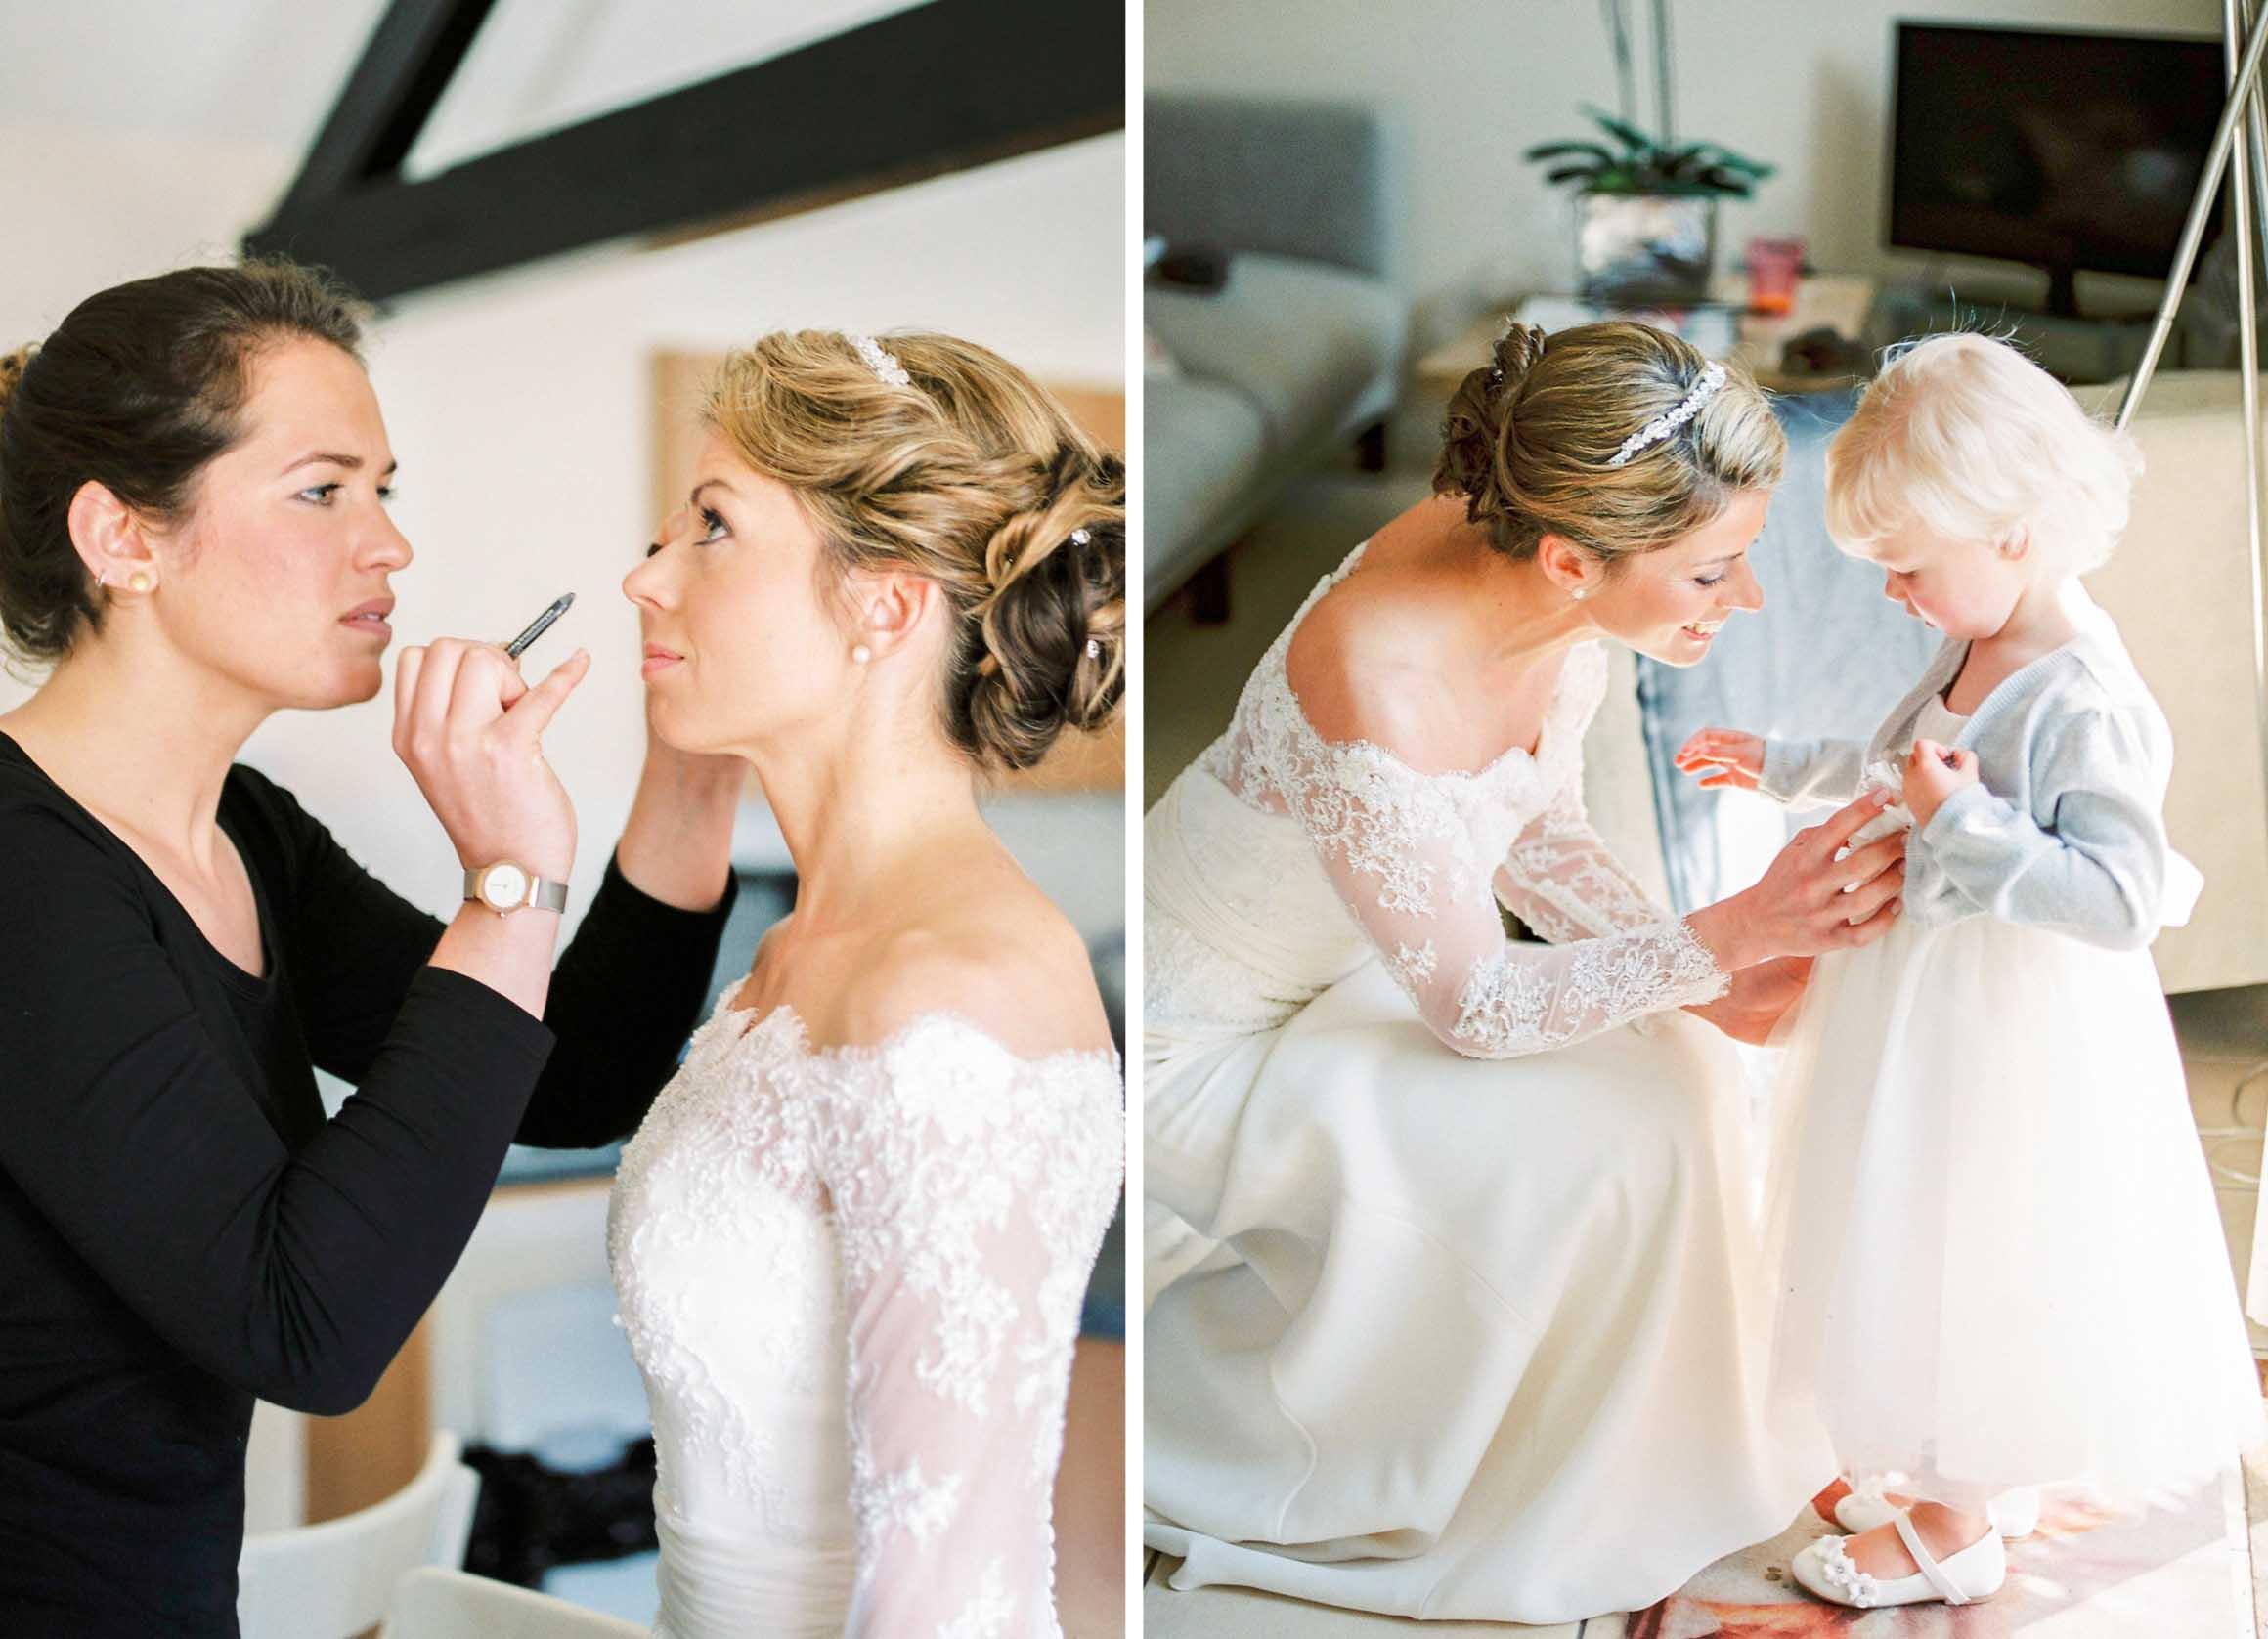 Amy O'Boyle Photography- Destination & UK Fine Art Film Wedding Photographer- English Country Wedding17.jpg